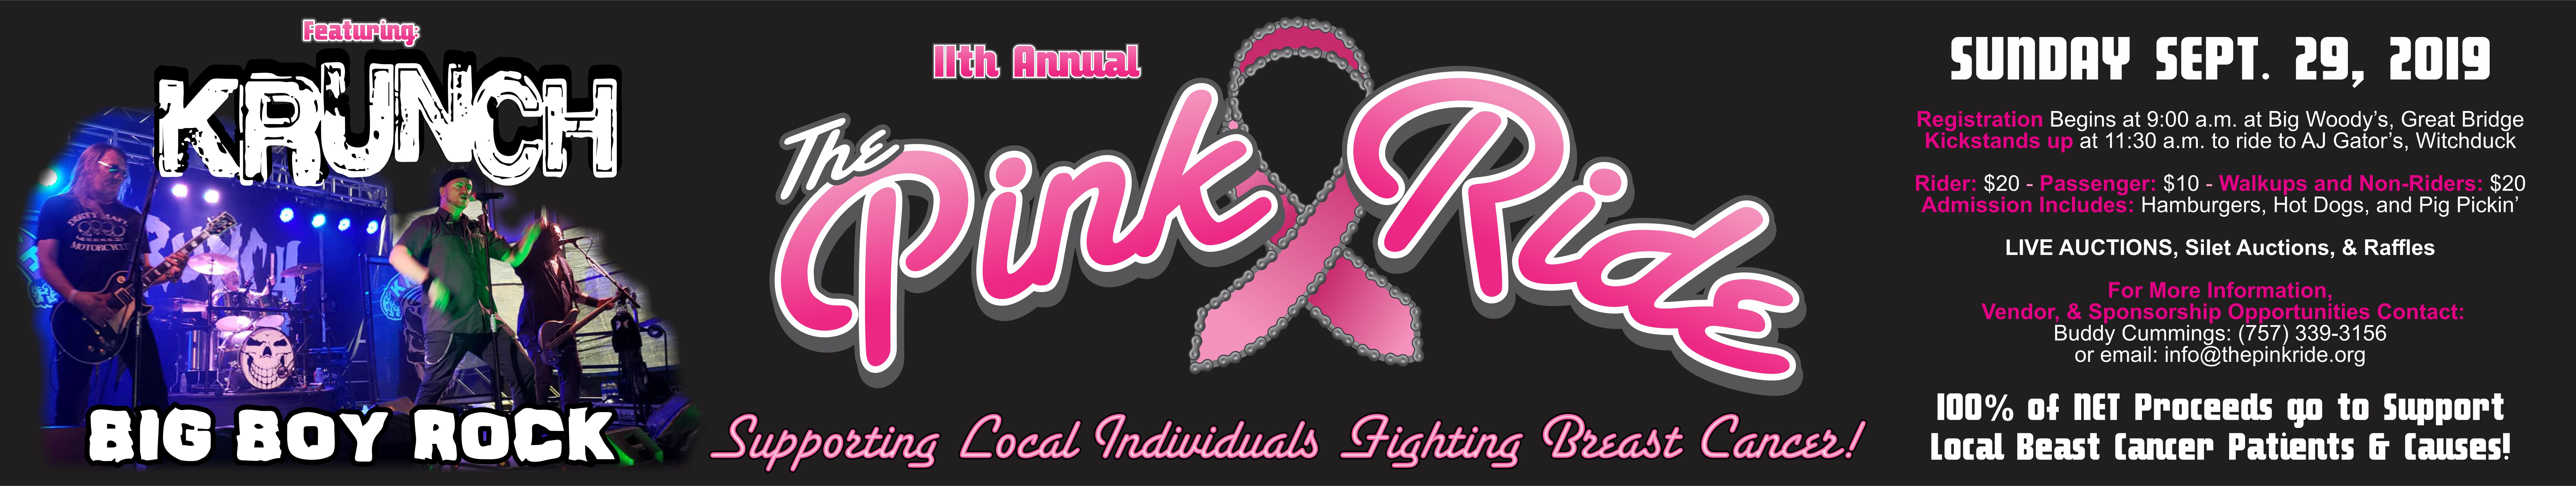 2019 Pink Ride Banner